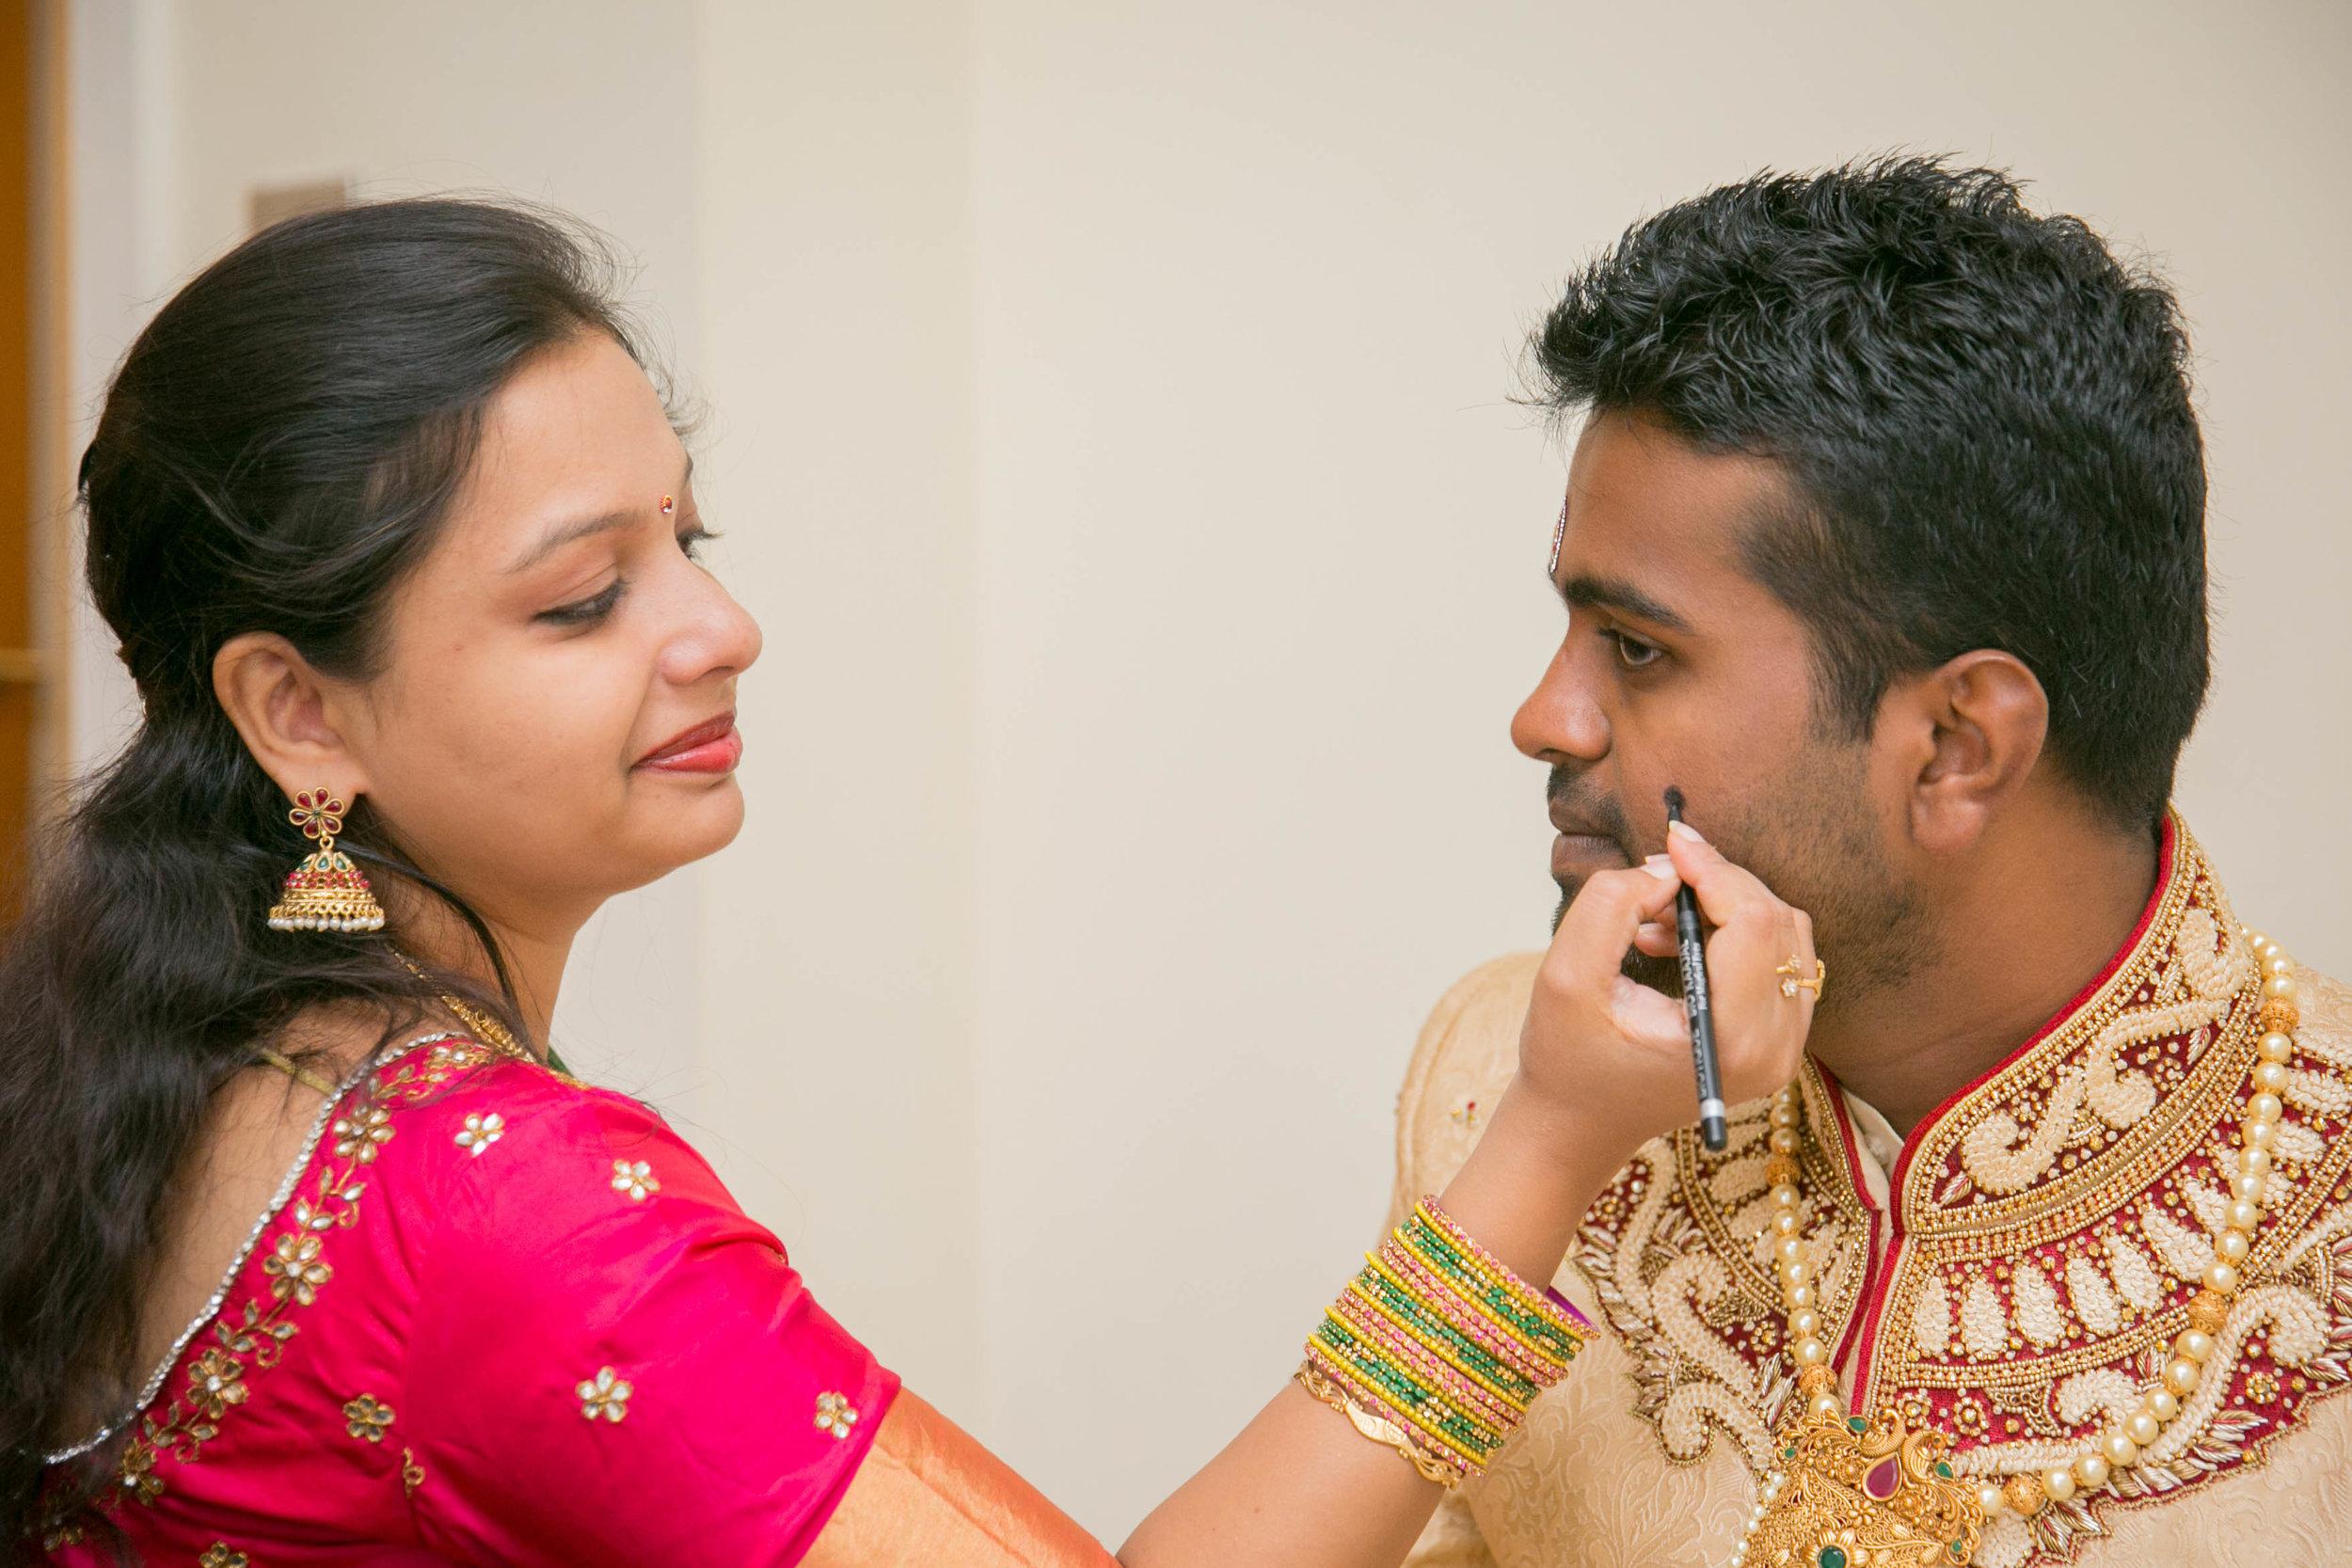 premier-banquetting-london-Hindu-asian-wedding-photographer-natalia-smith-photography-3.jpg